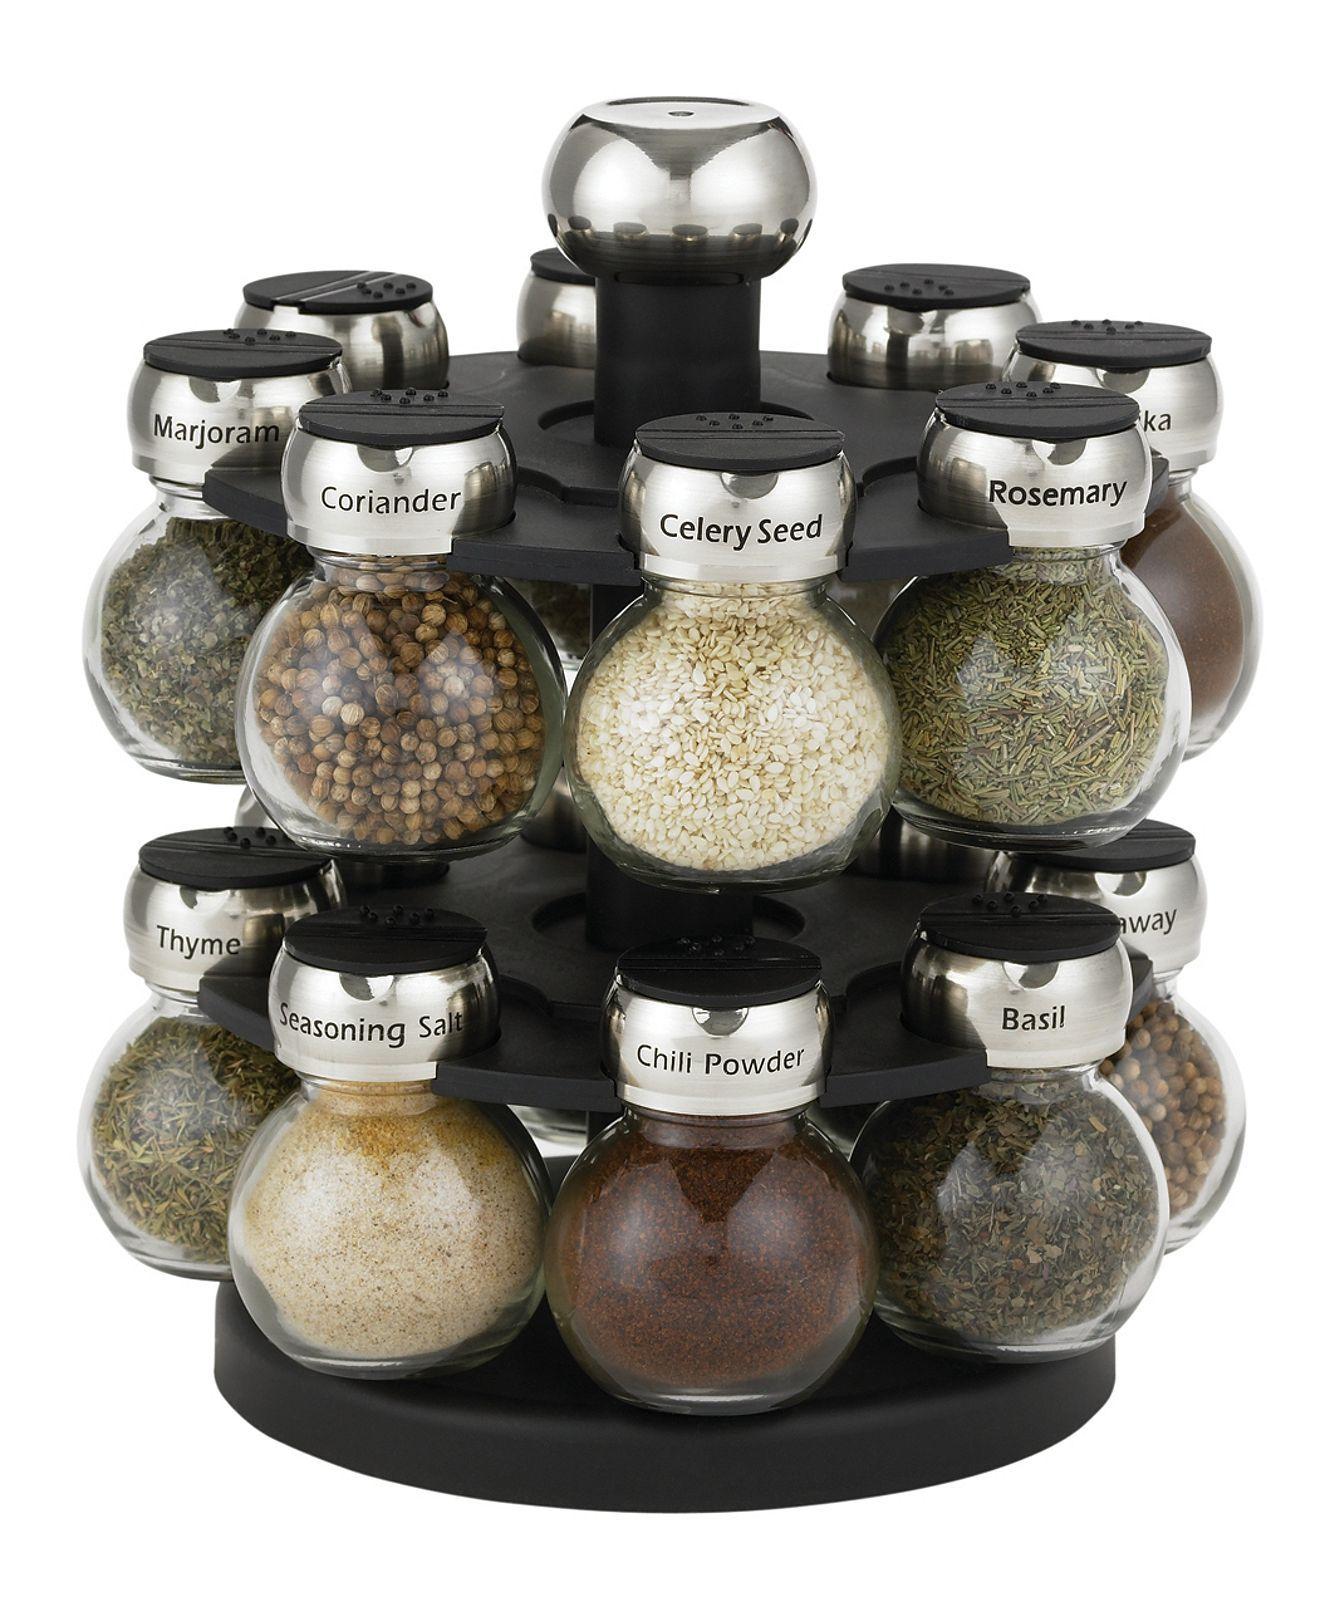 martha stewart collection 17 piece orbital spice rack set created